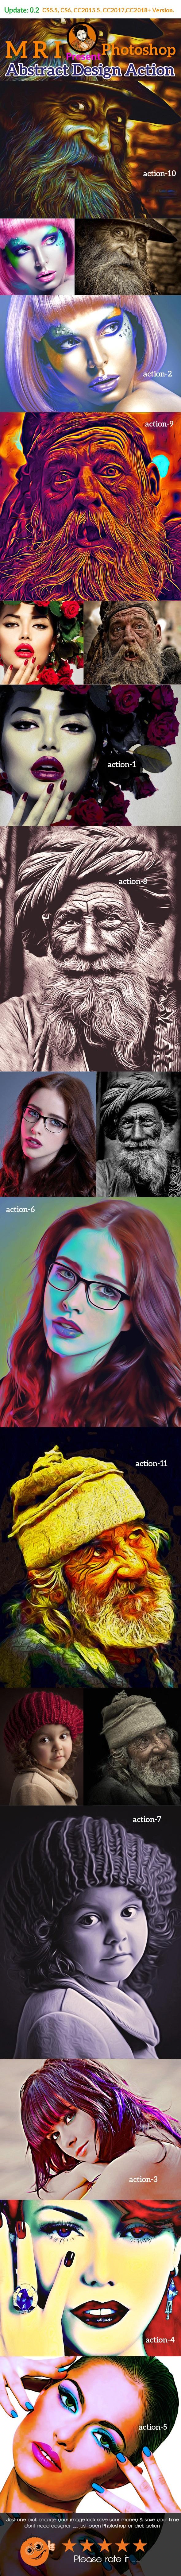 Oil Art Action - Actions Photoshop